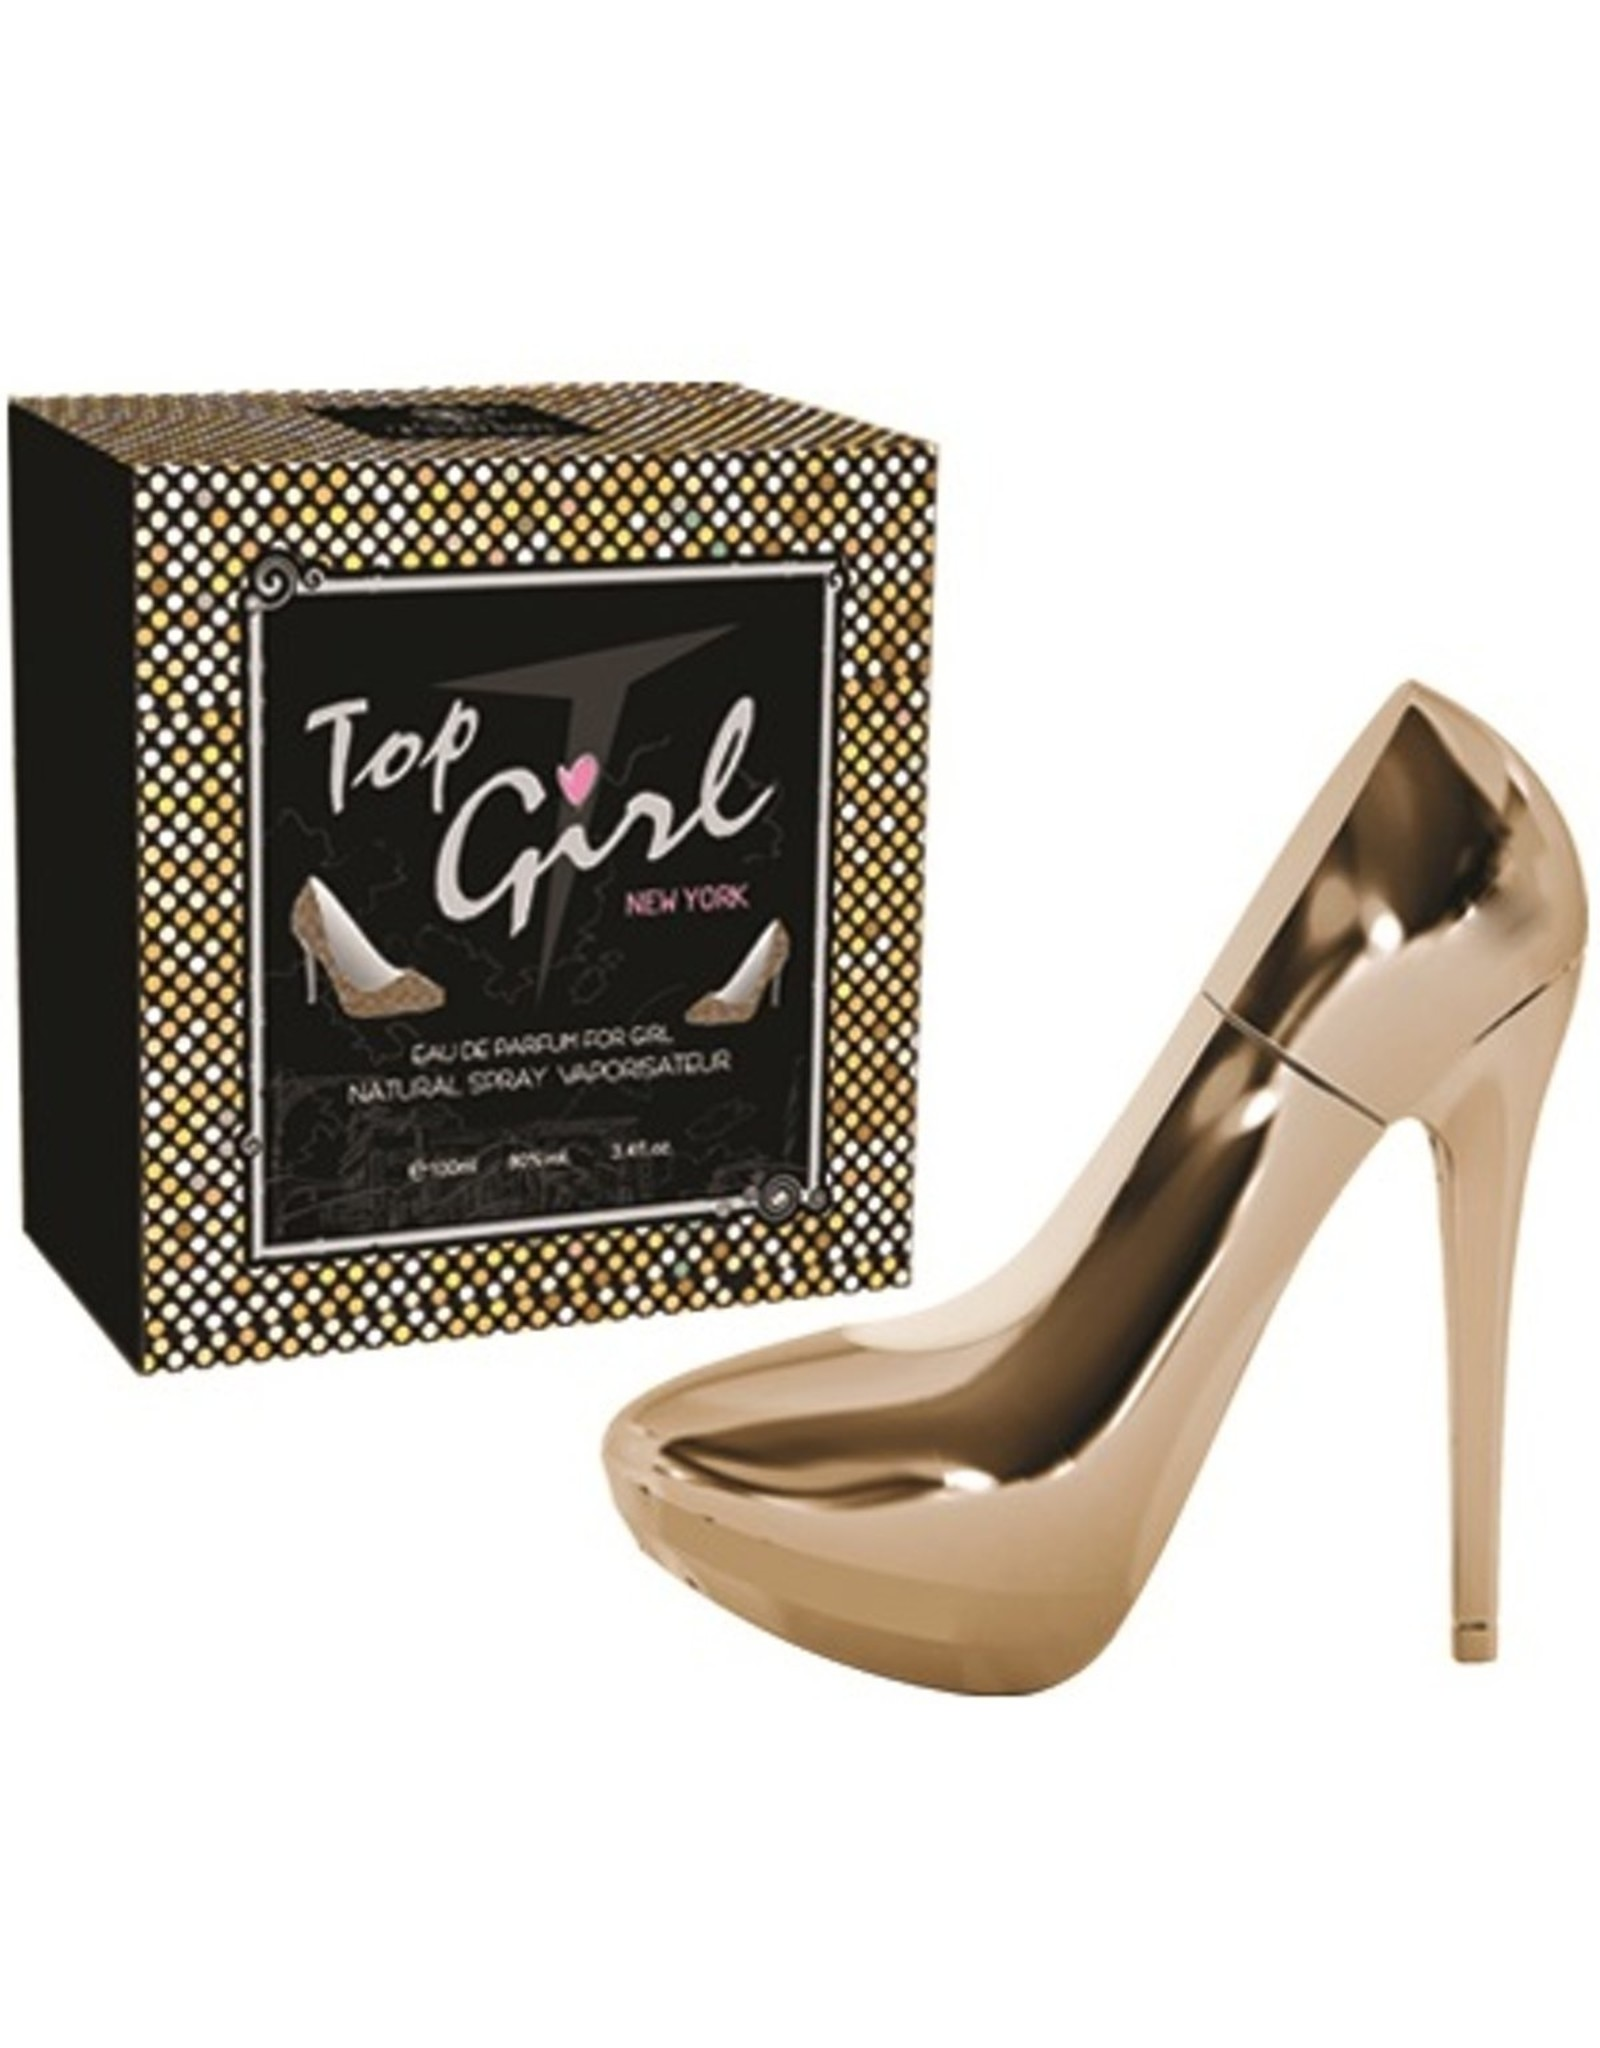 Tiverton Top Girl New York EDP 100 ml